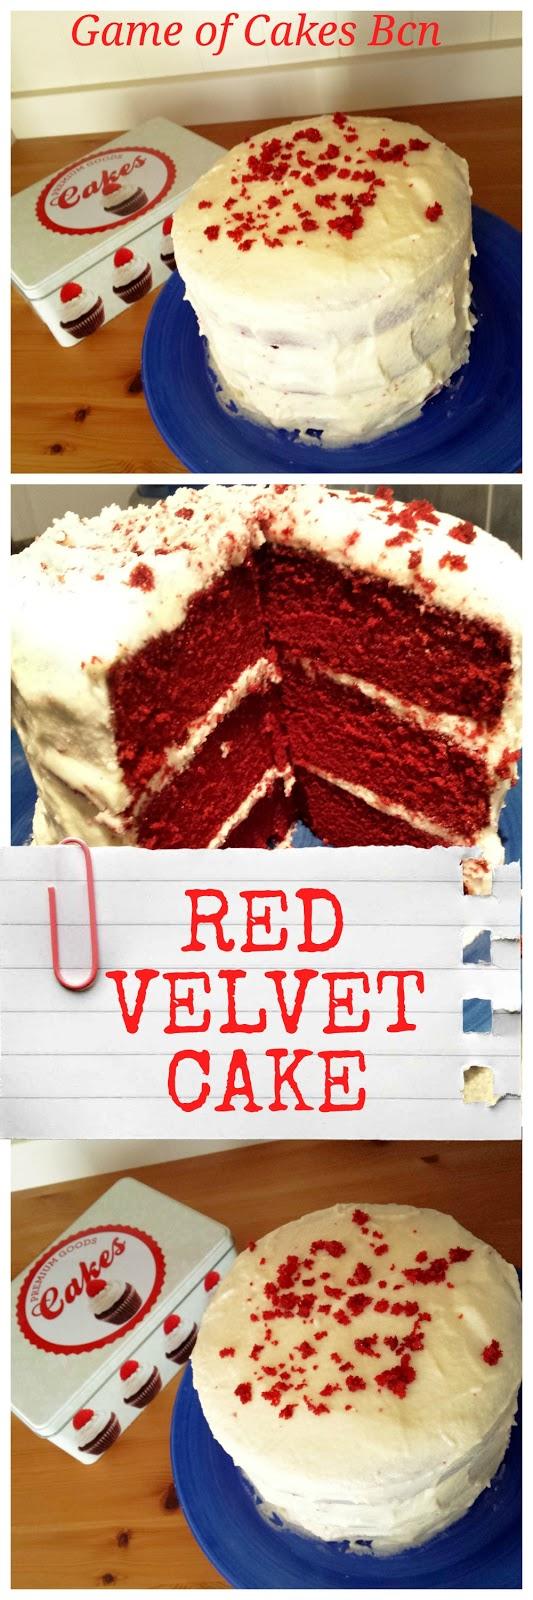 Red Velvet Cake con cobertura de Mascarpone